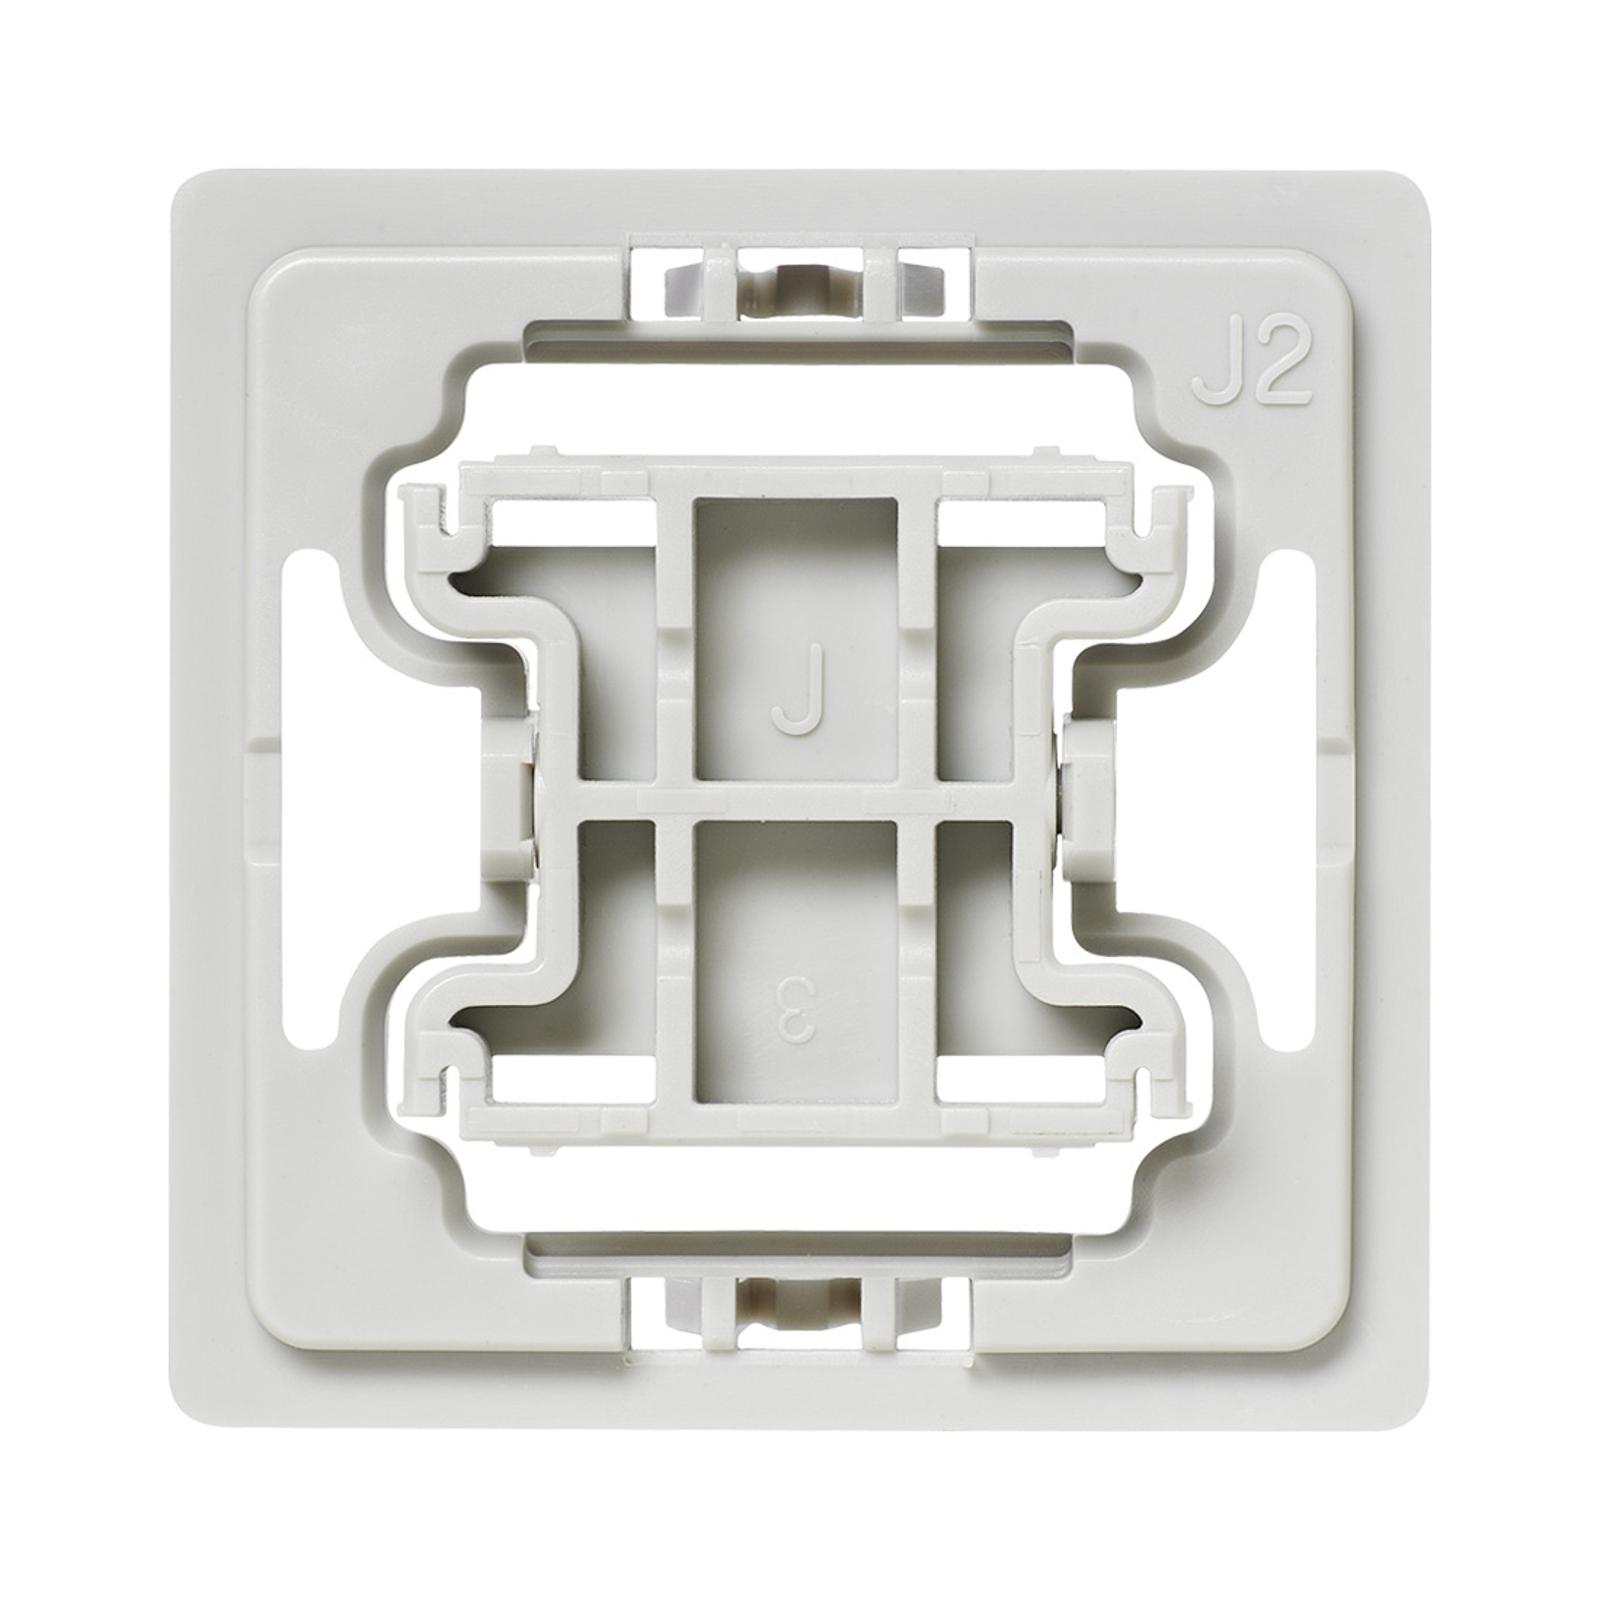 Homematic IP adaptateur interrupteurs Jung J2 20x